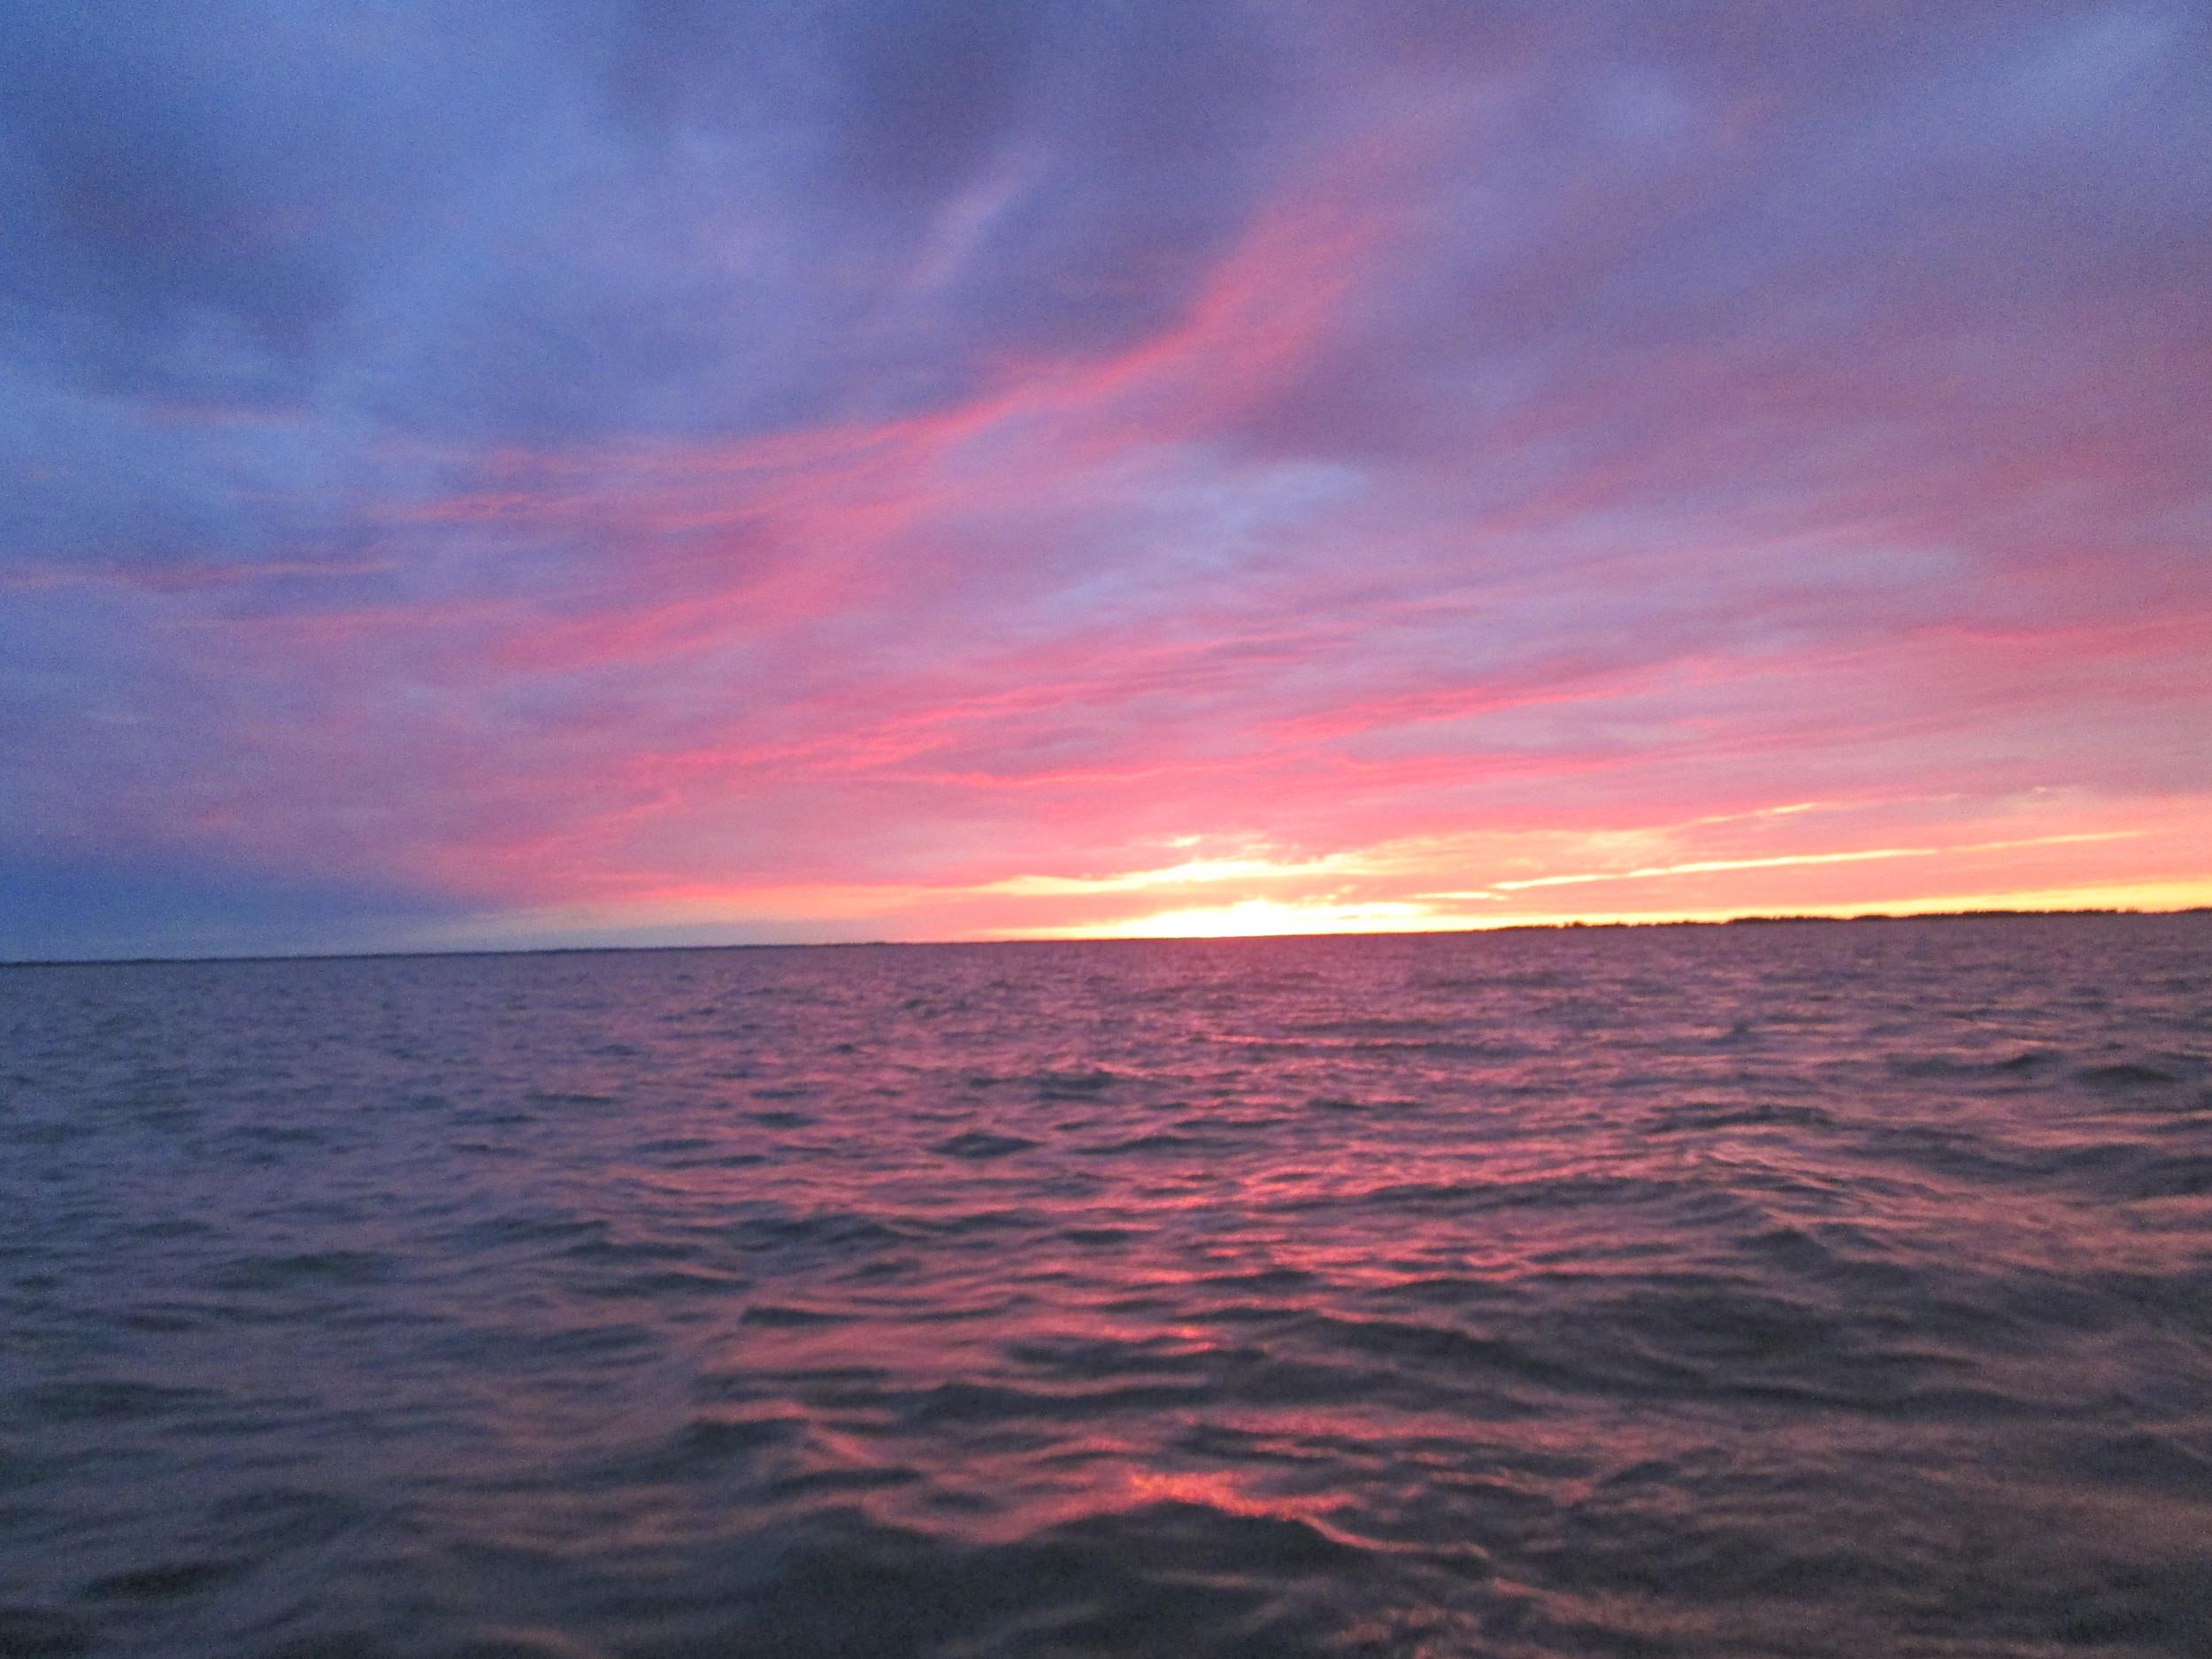 'Big lakes make big sunsets' Marc